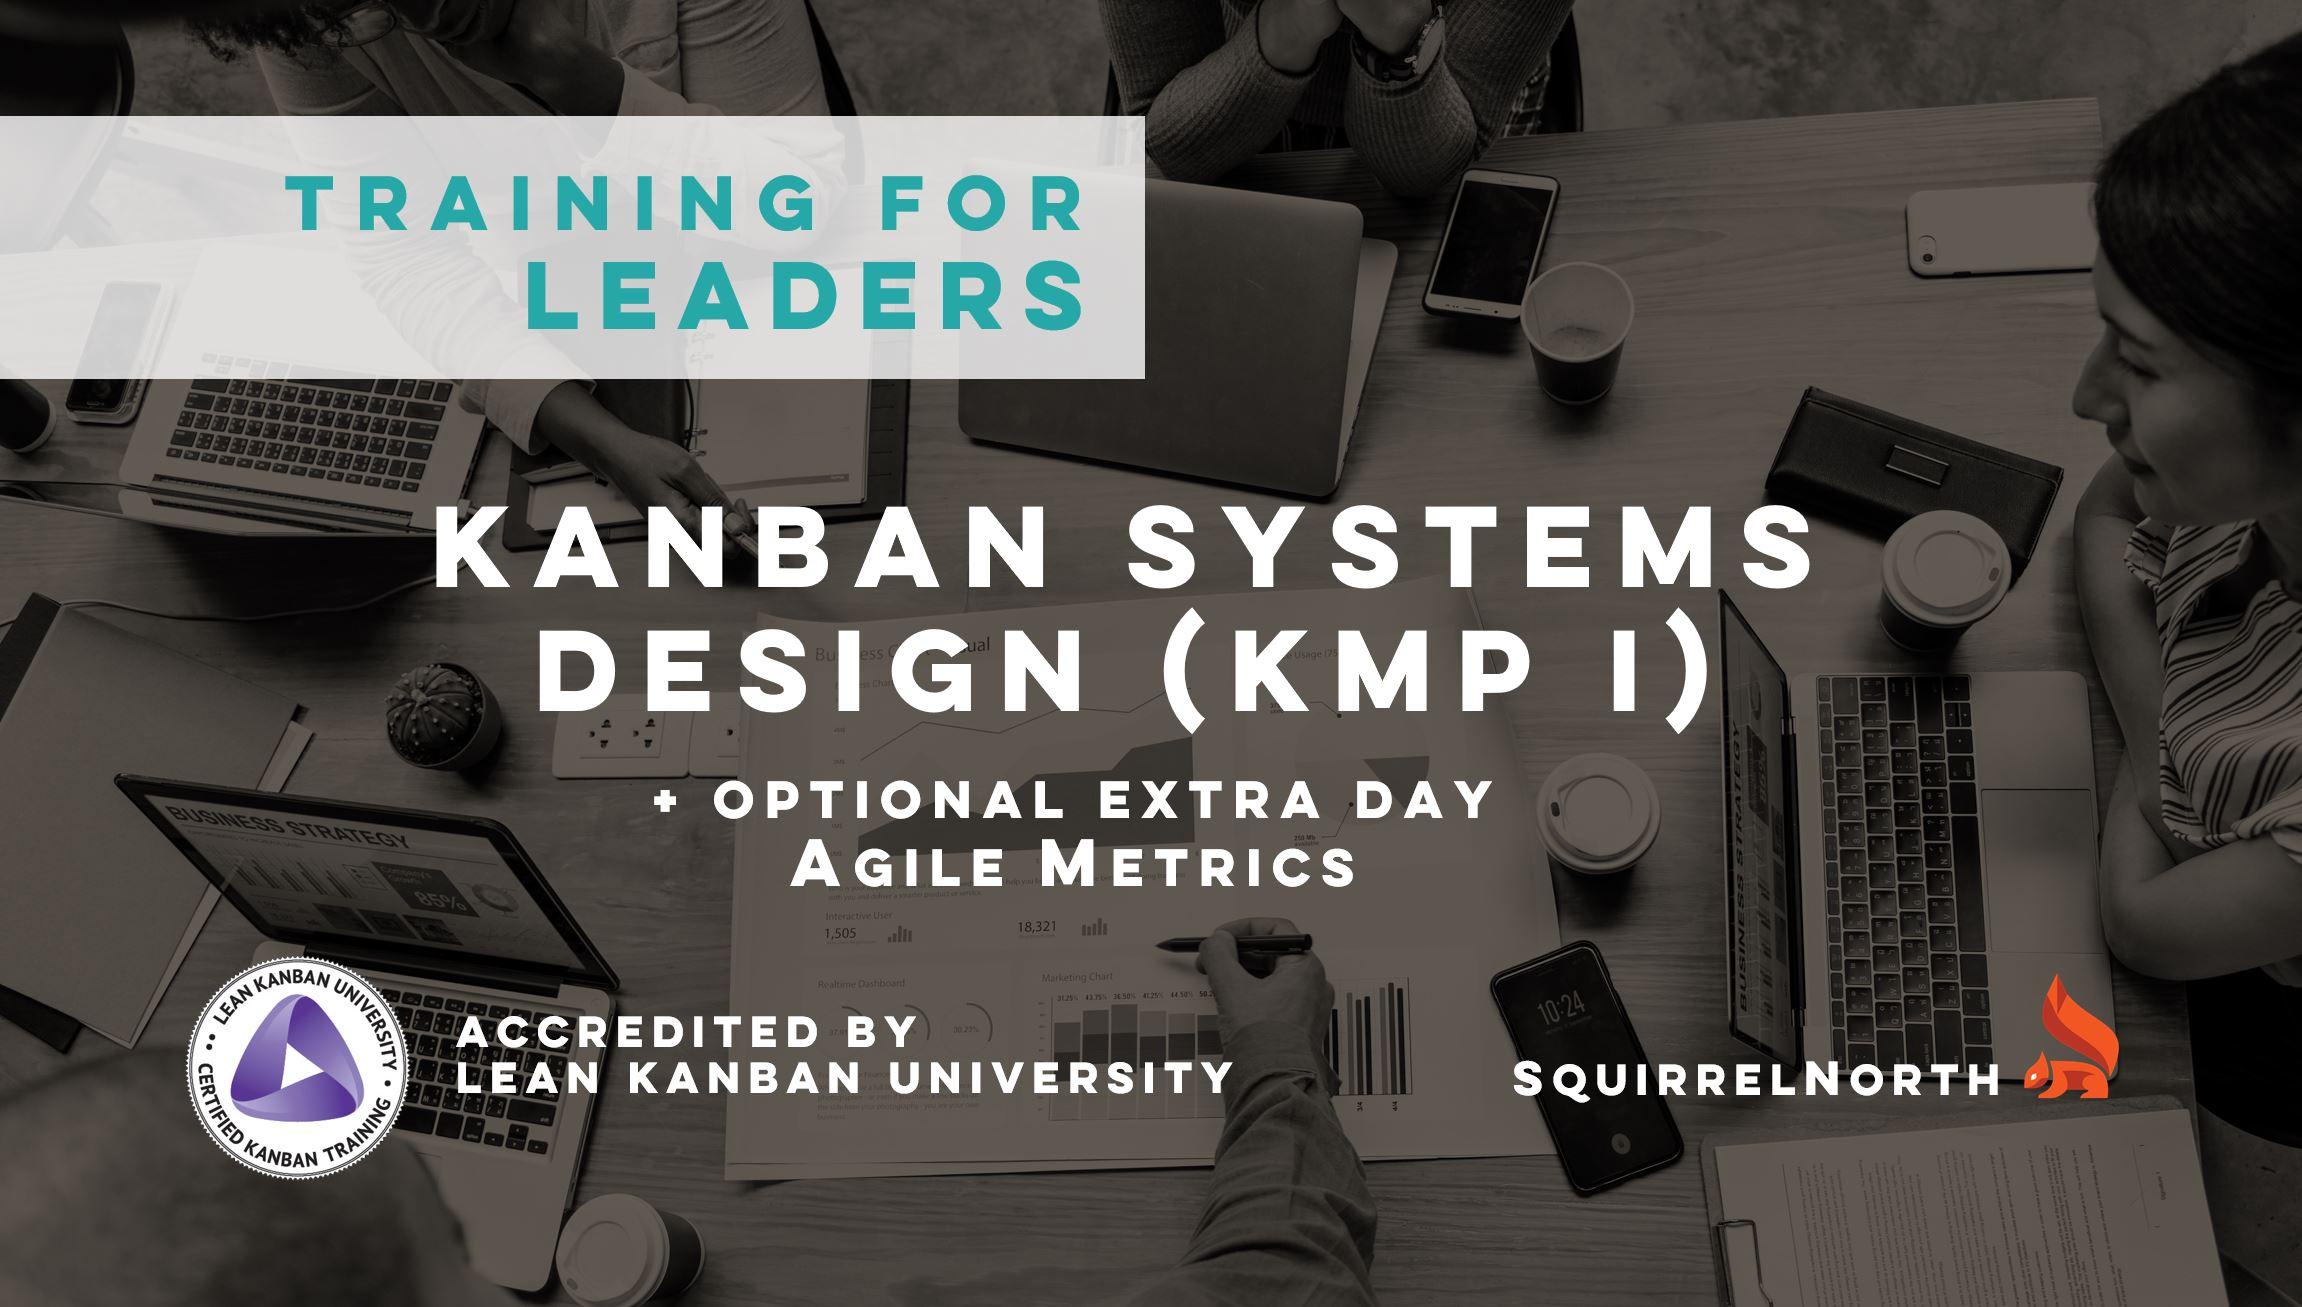 KMP I - Kanban System Design® + OPTIONAL AGILE METRICS